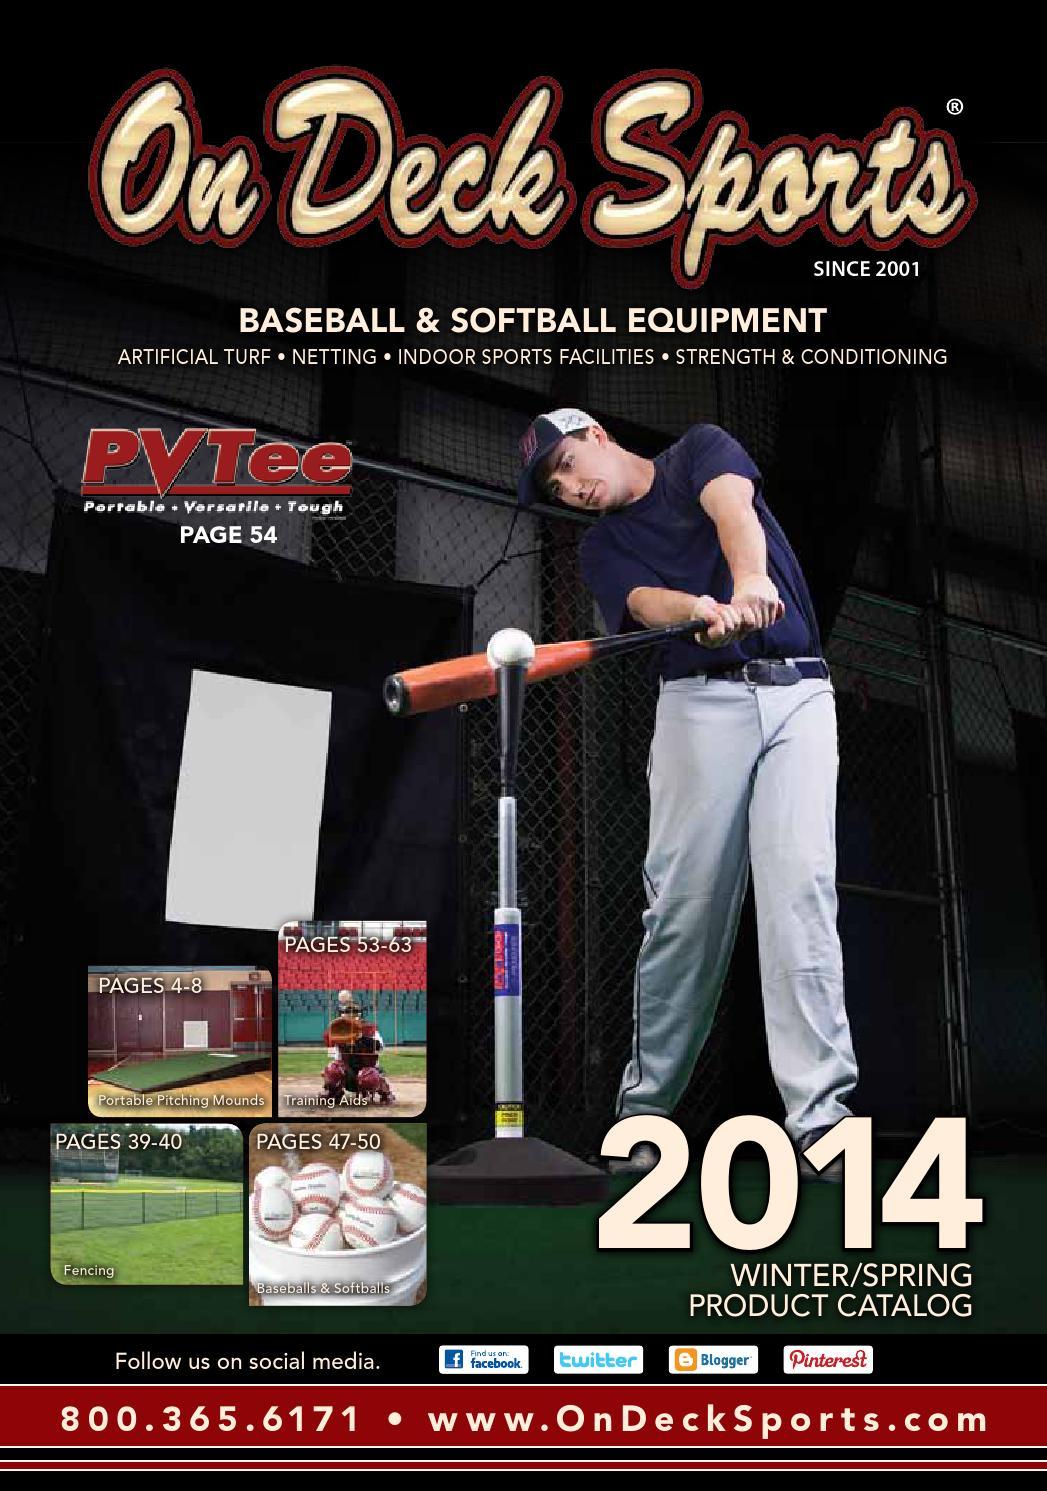 On Deck Sports 2014 Baseball and Softball Equipment Catalog